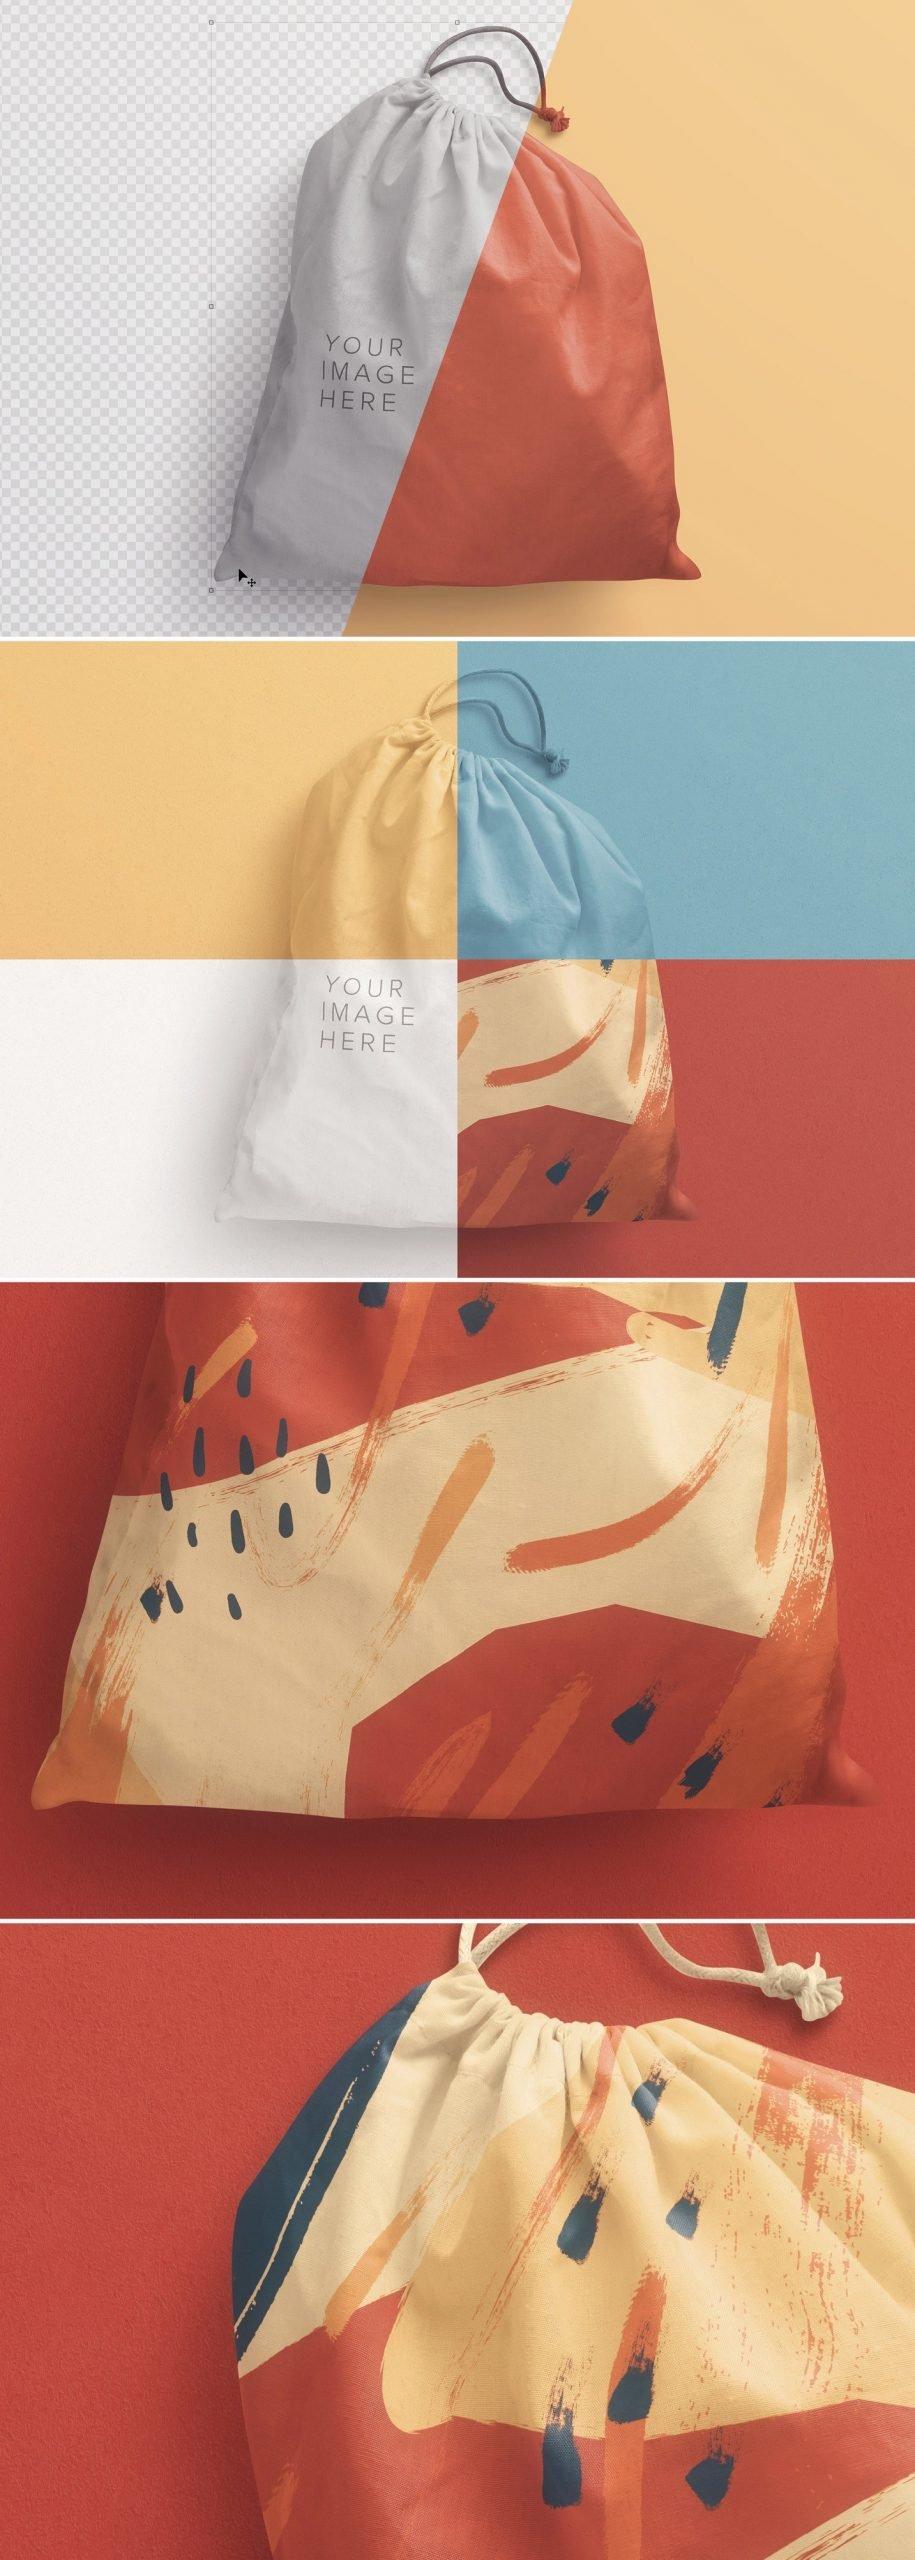 drawstring sack bag mockup preview1 1 scaled